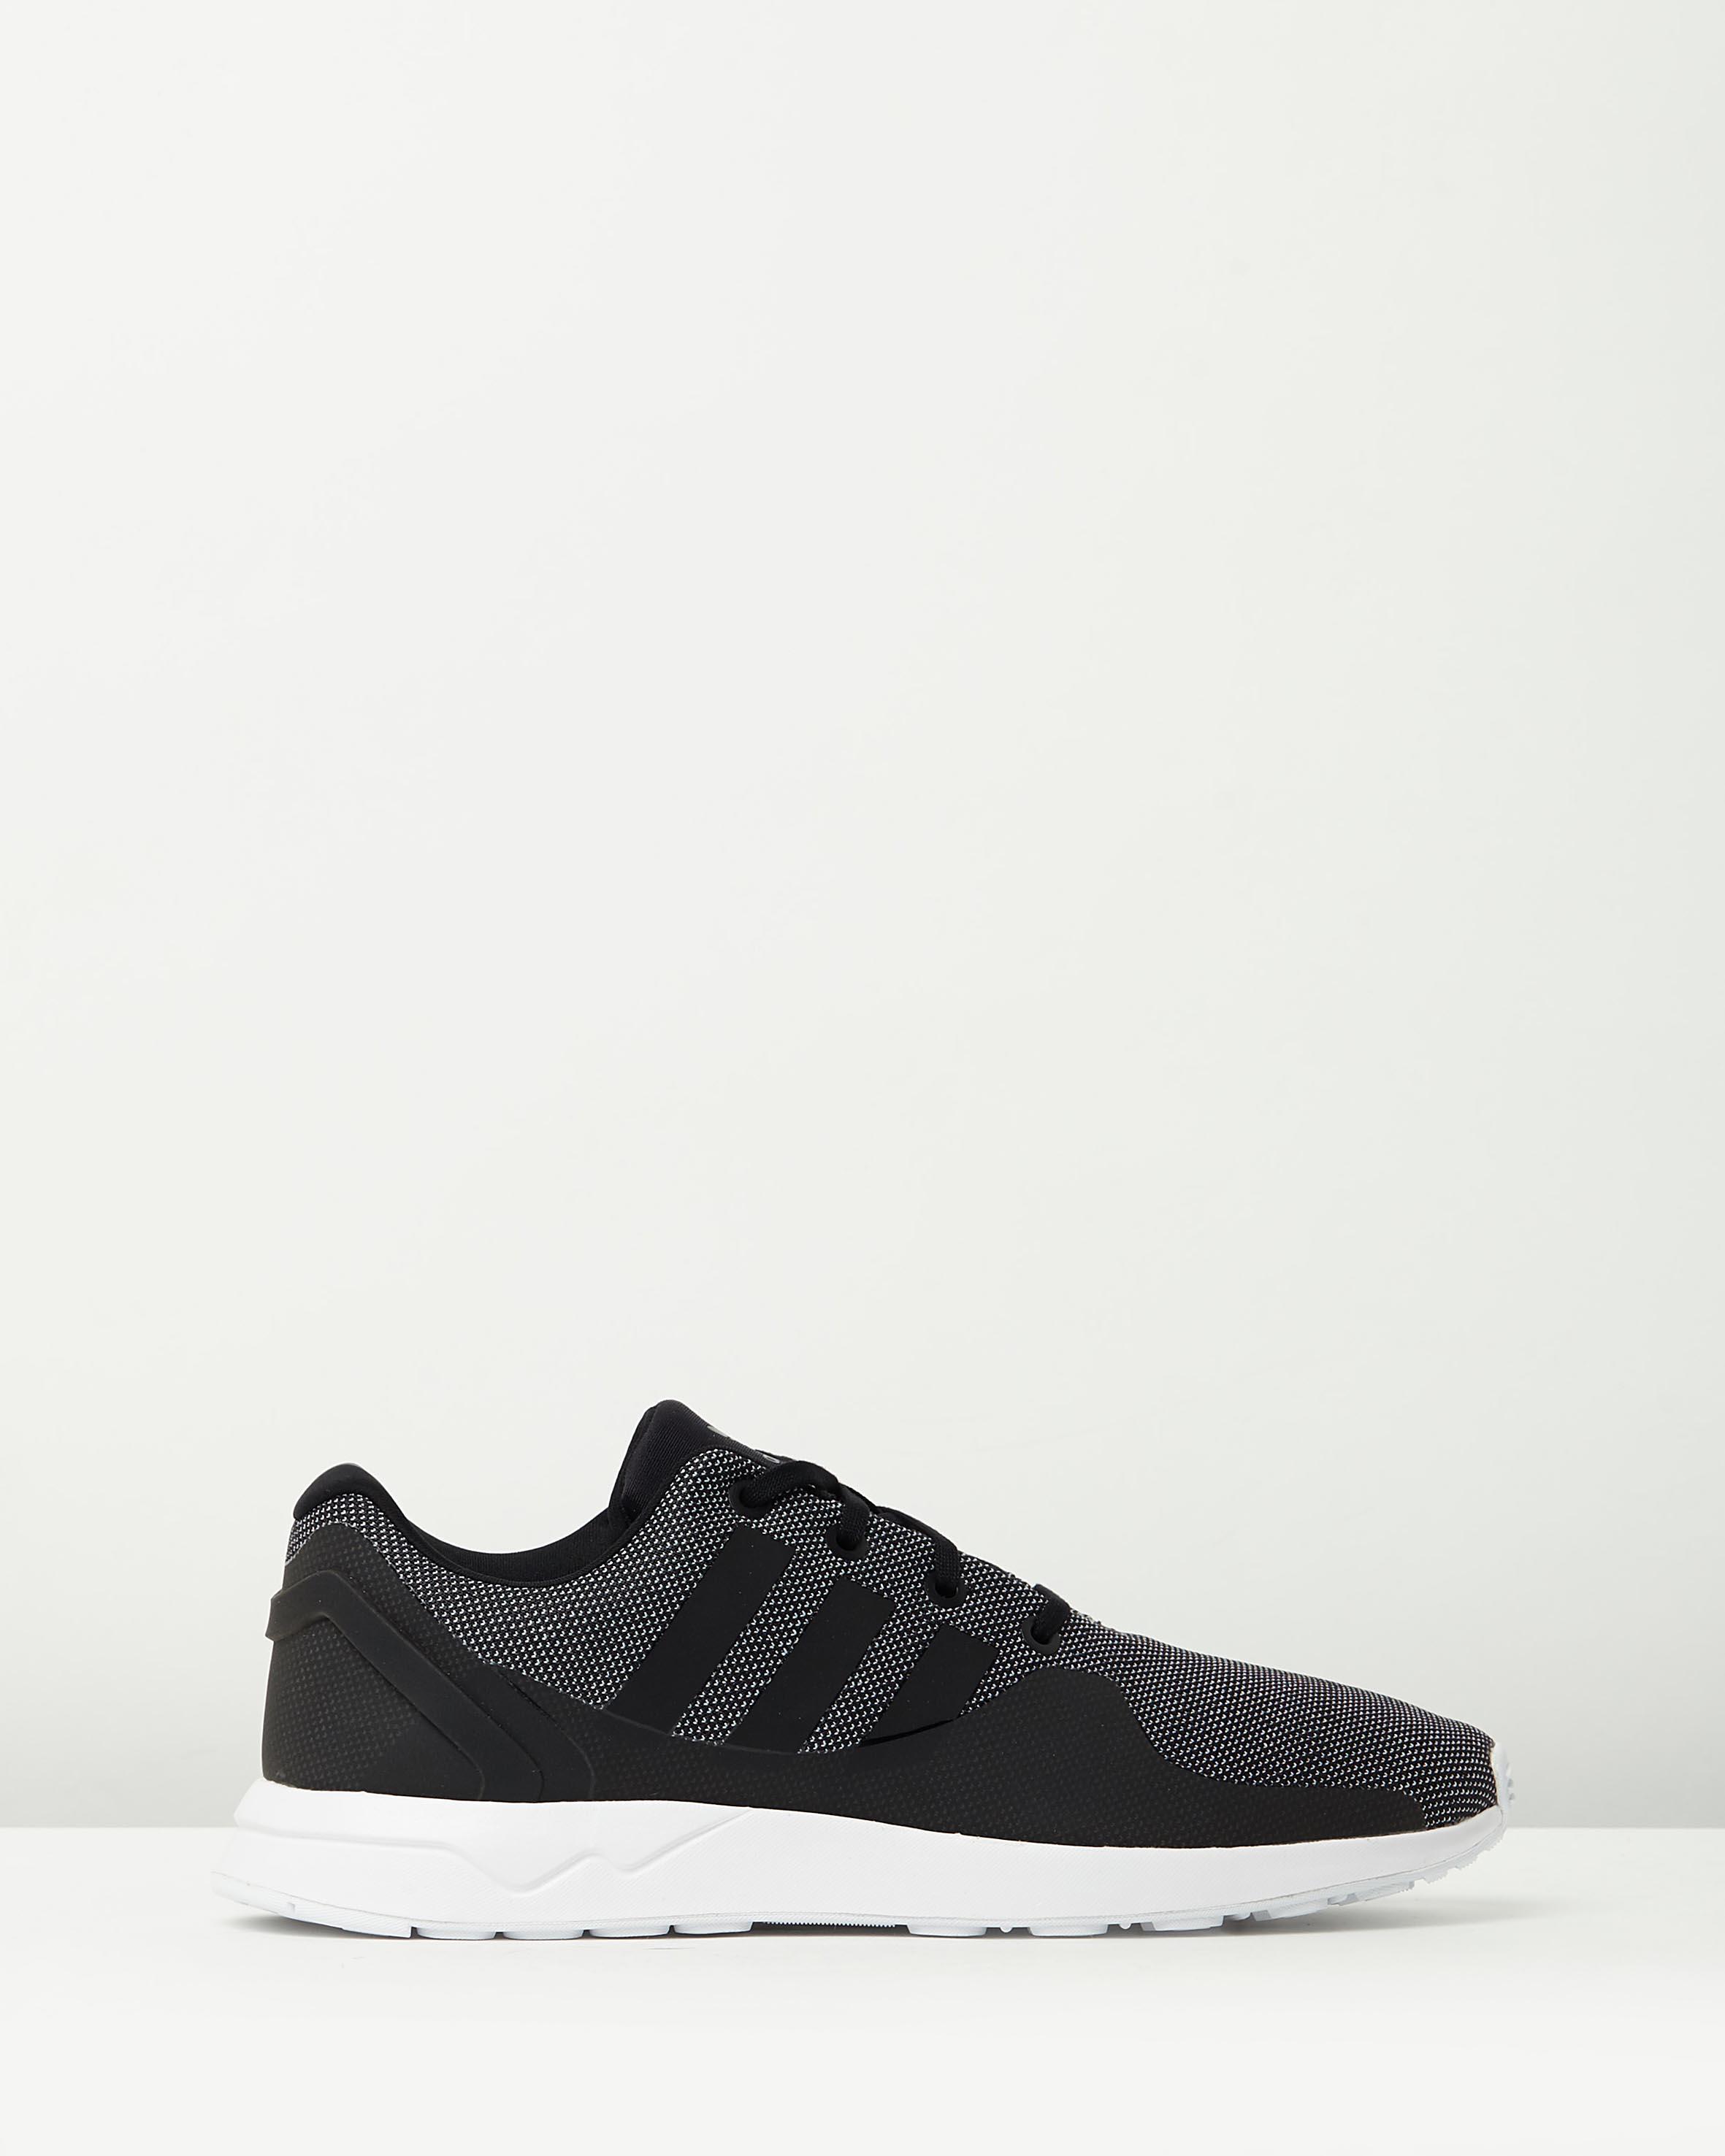 Adidas Zx Flux Adv Tech Black